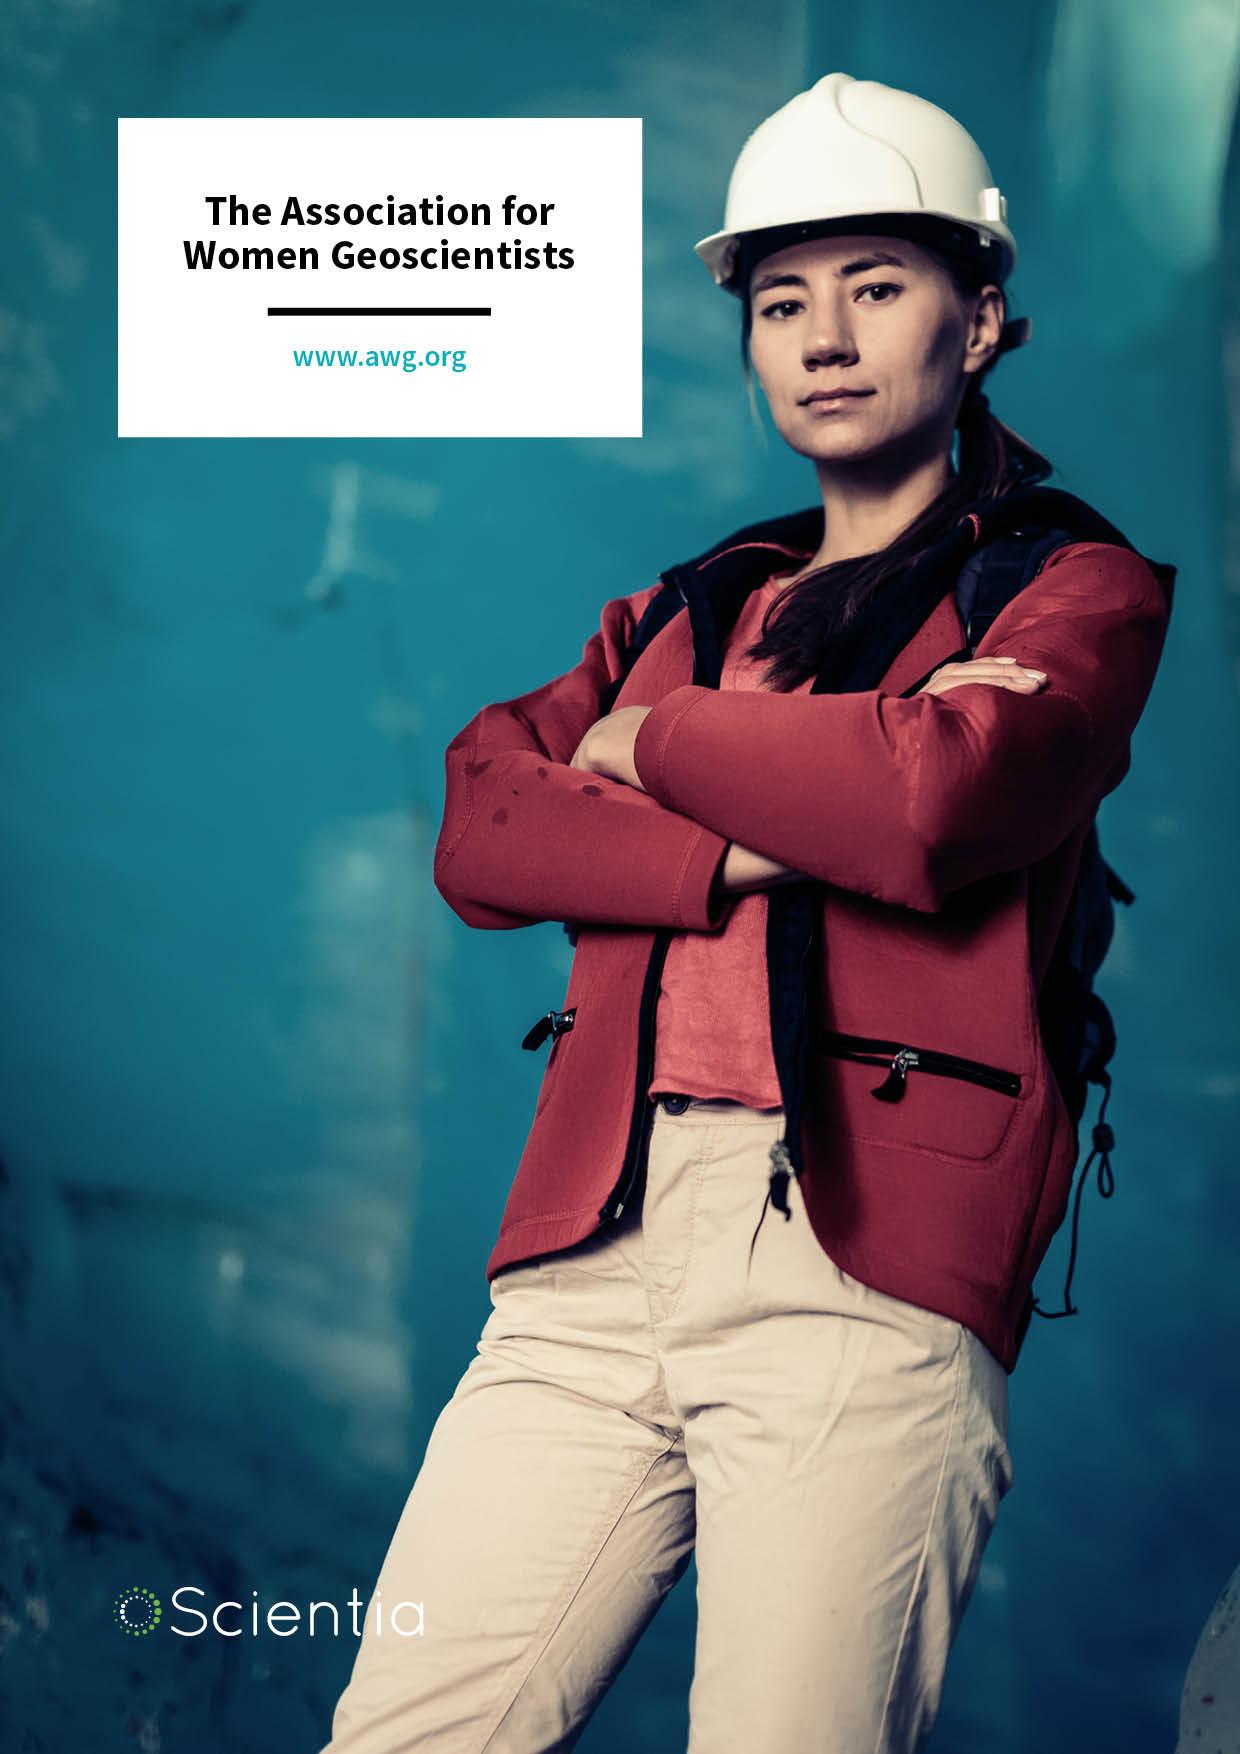 The Association for Women Geoscientists